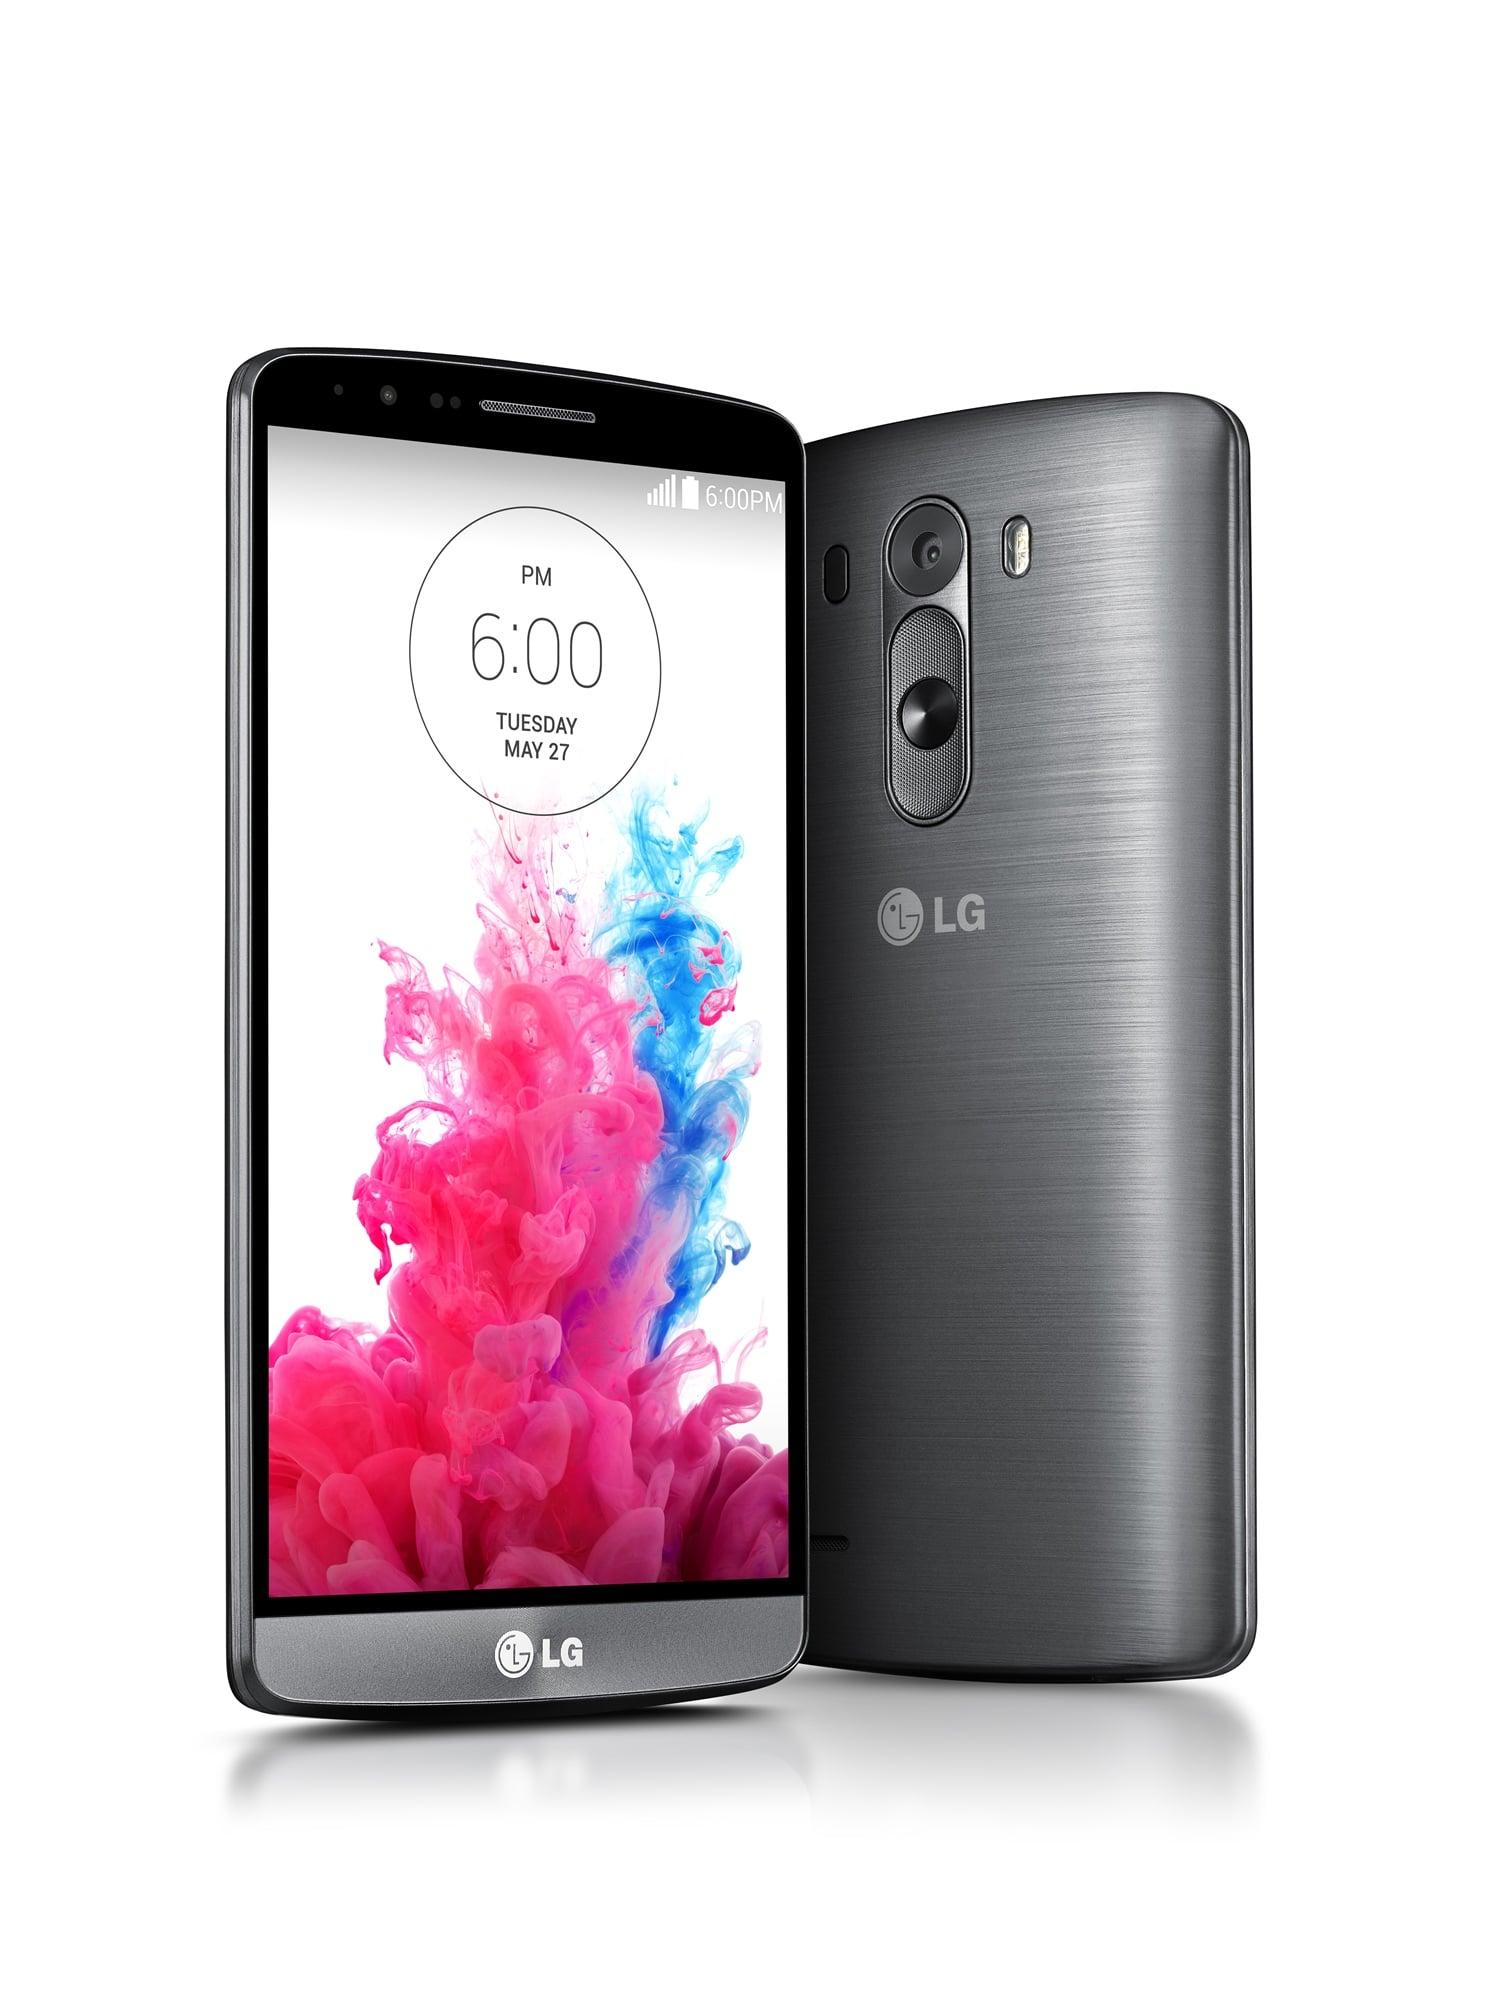 LG G3 in Metallic Black